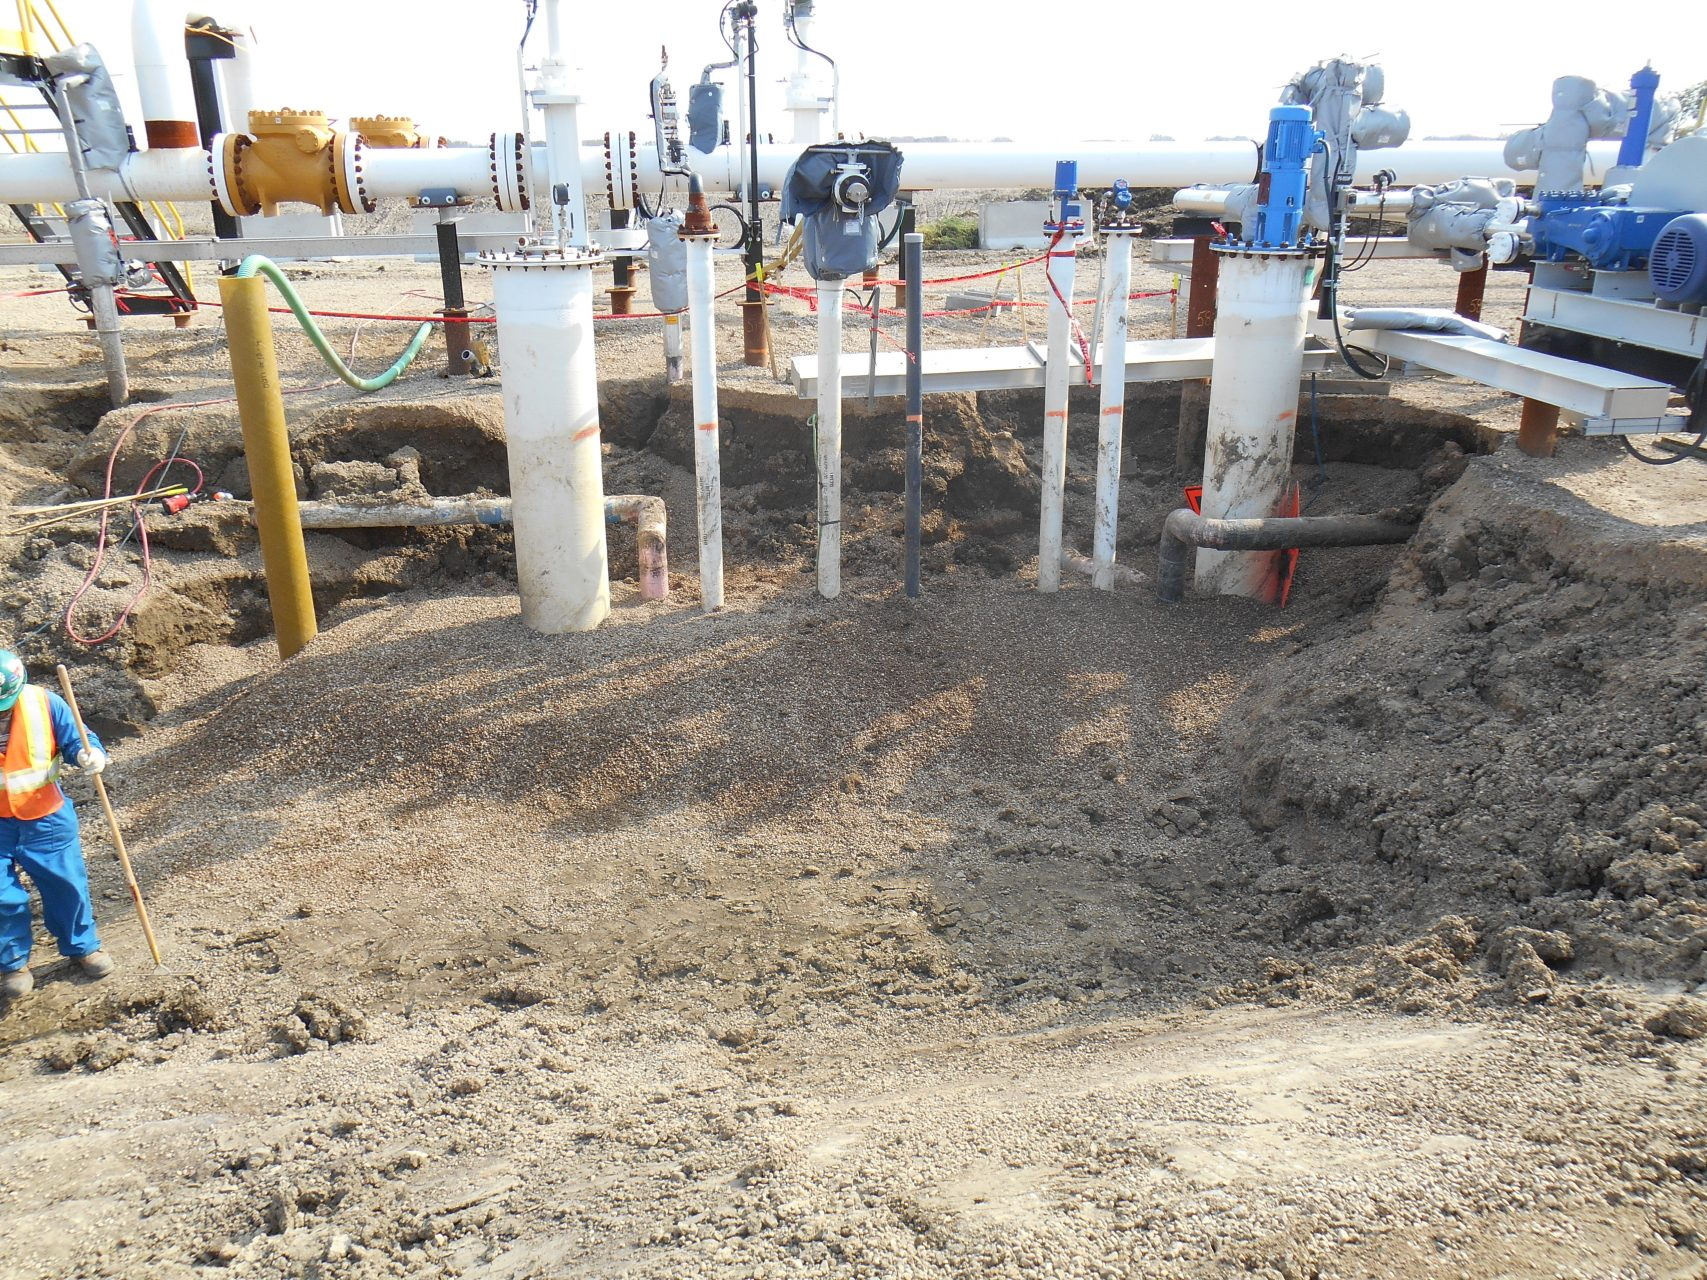 Steelman Bakken Pump Station